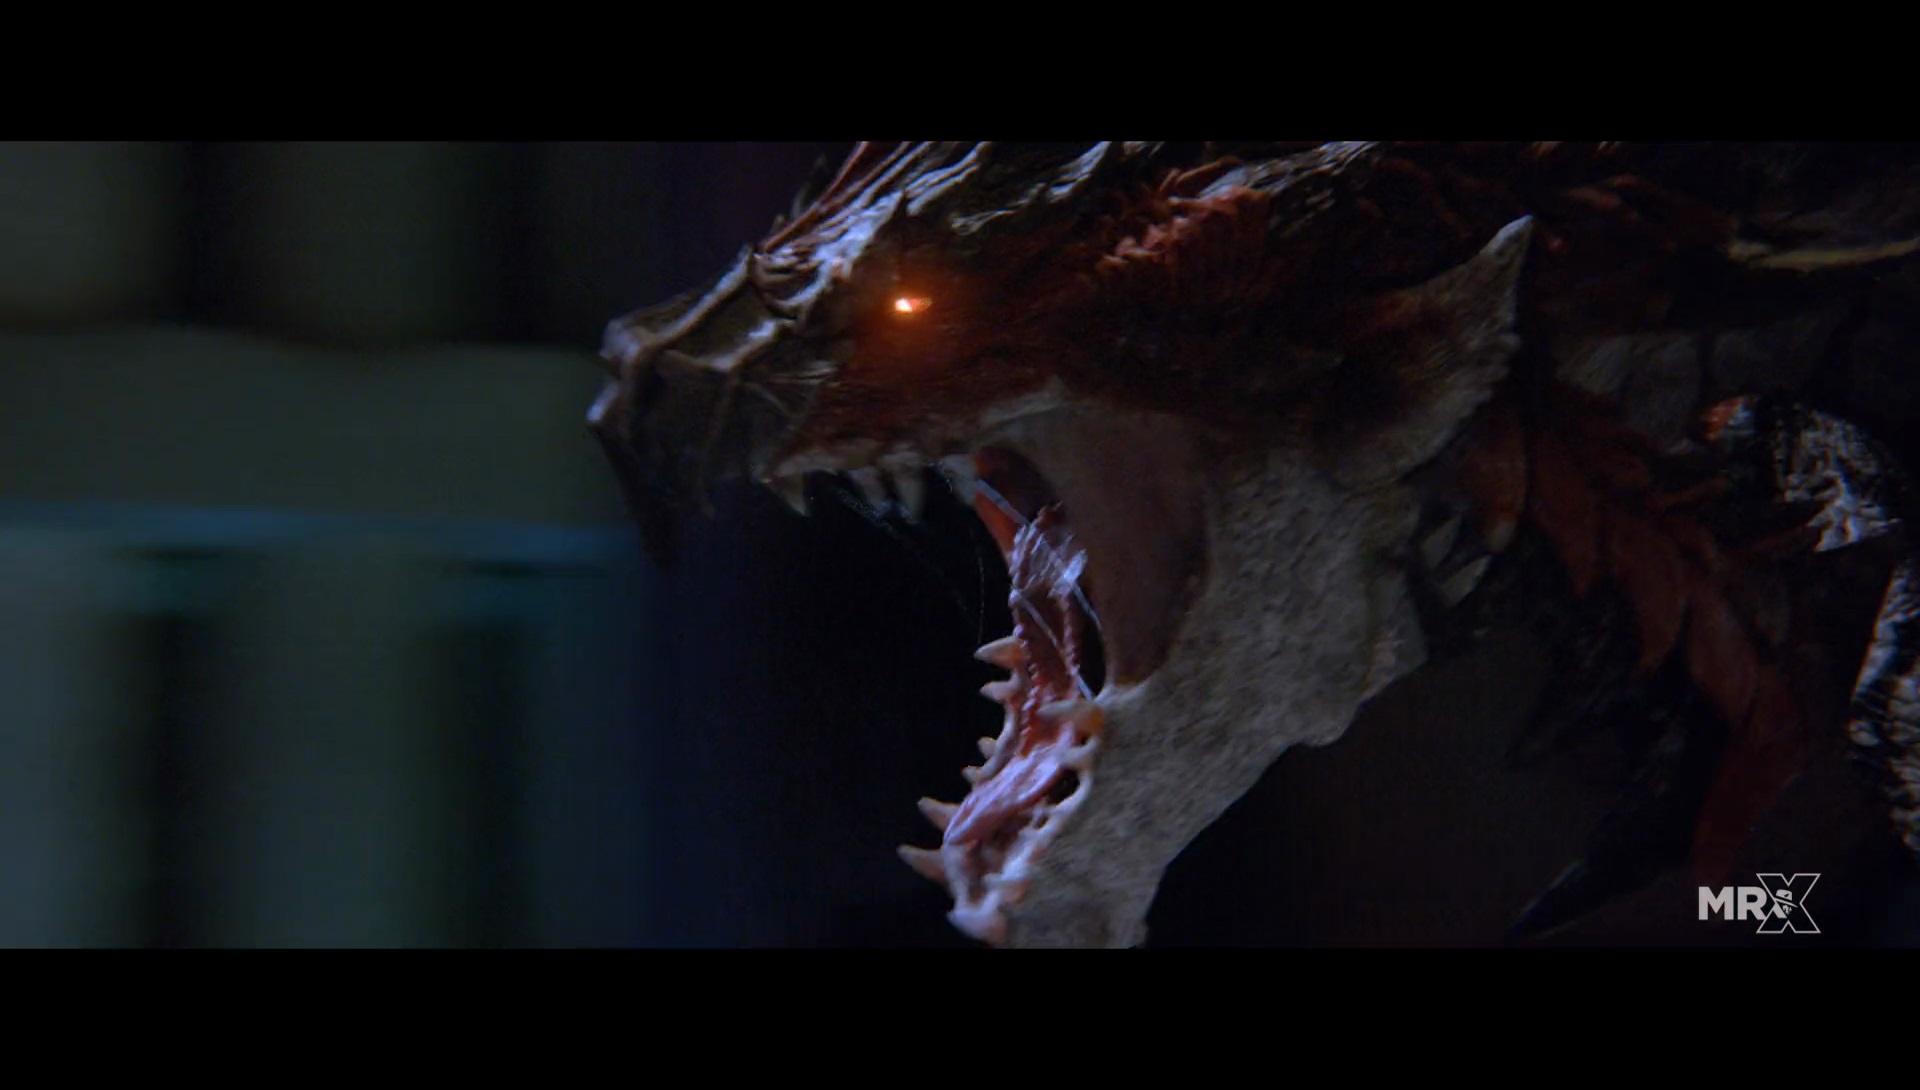 Monster Hunter Live Action Movie Release Date, Cast, Trailer